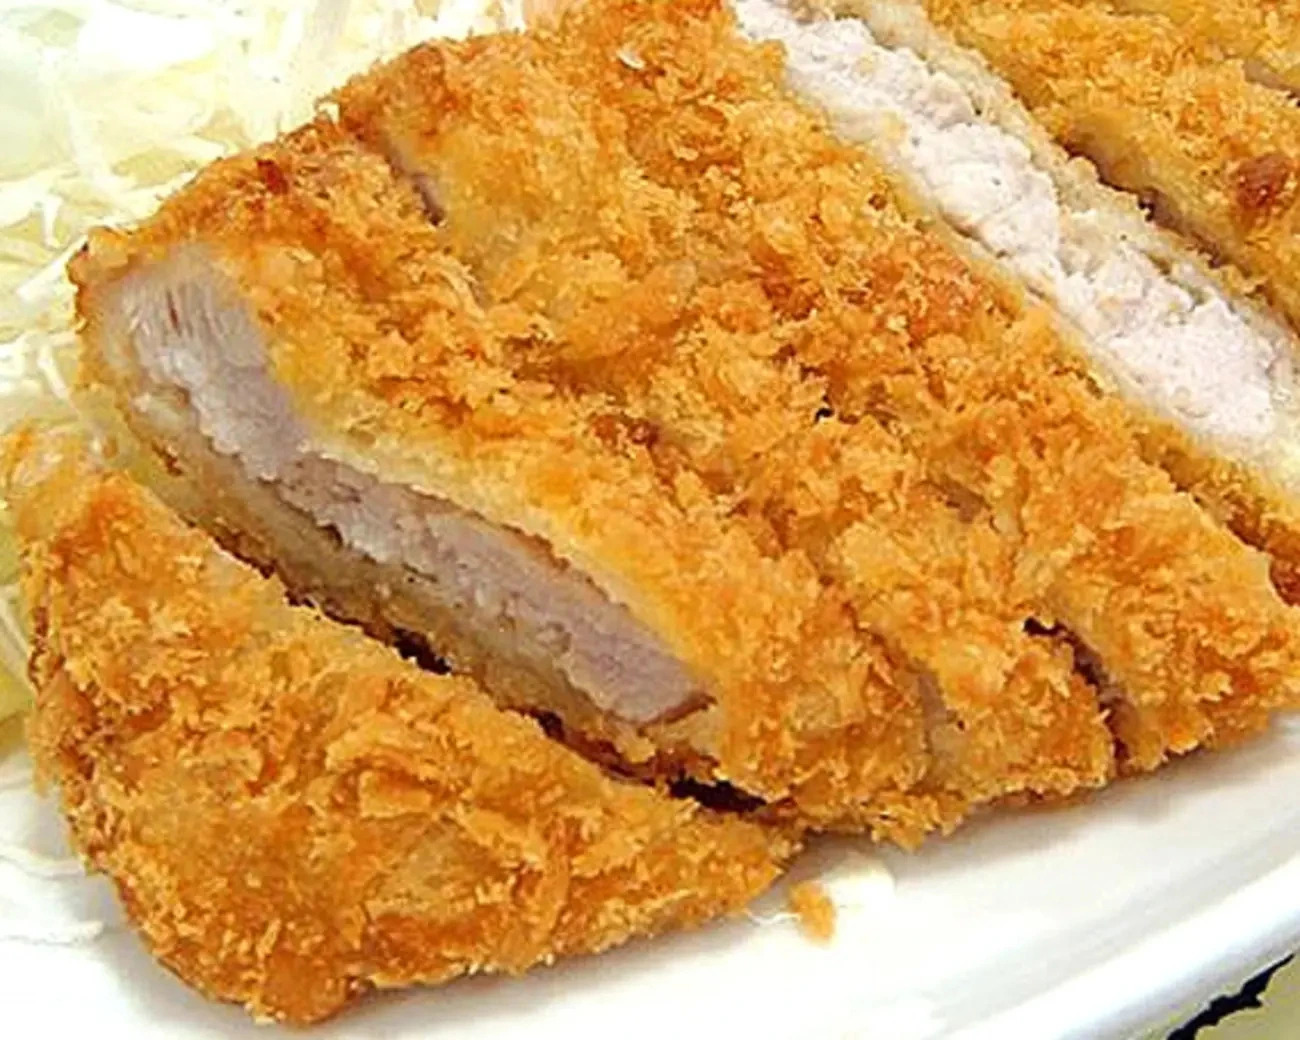 Resep Chicken Katsu Saus Opor yang Enak dan Aromatic